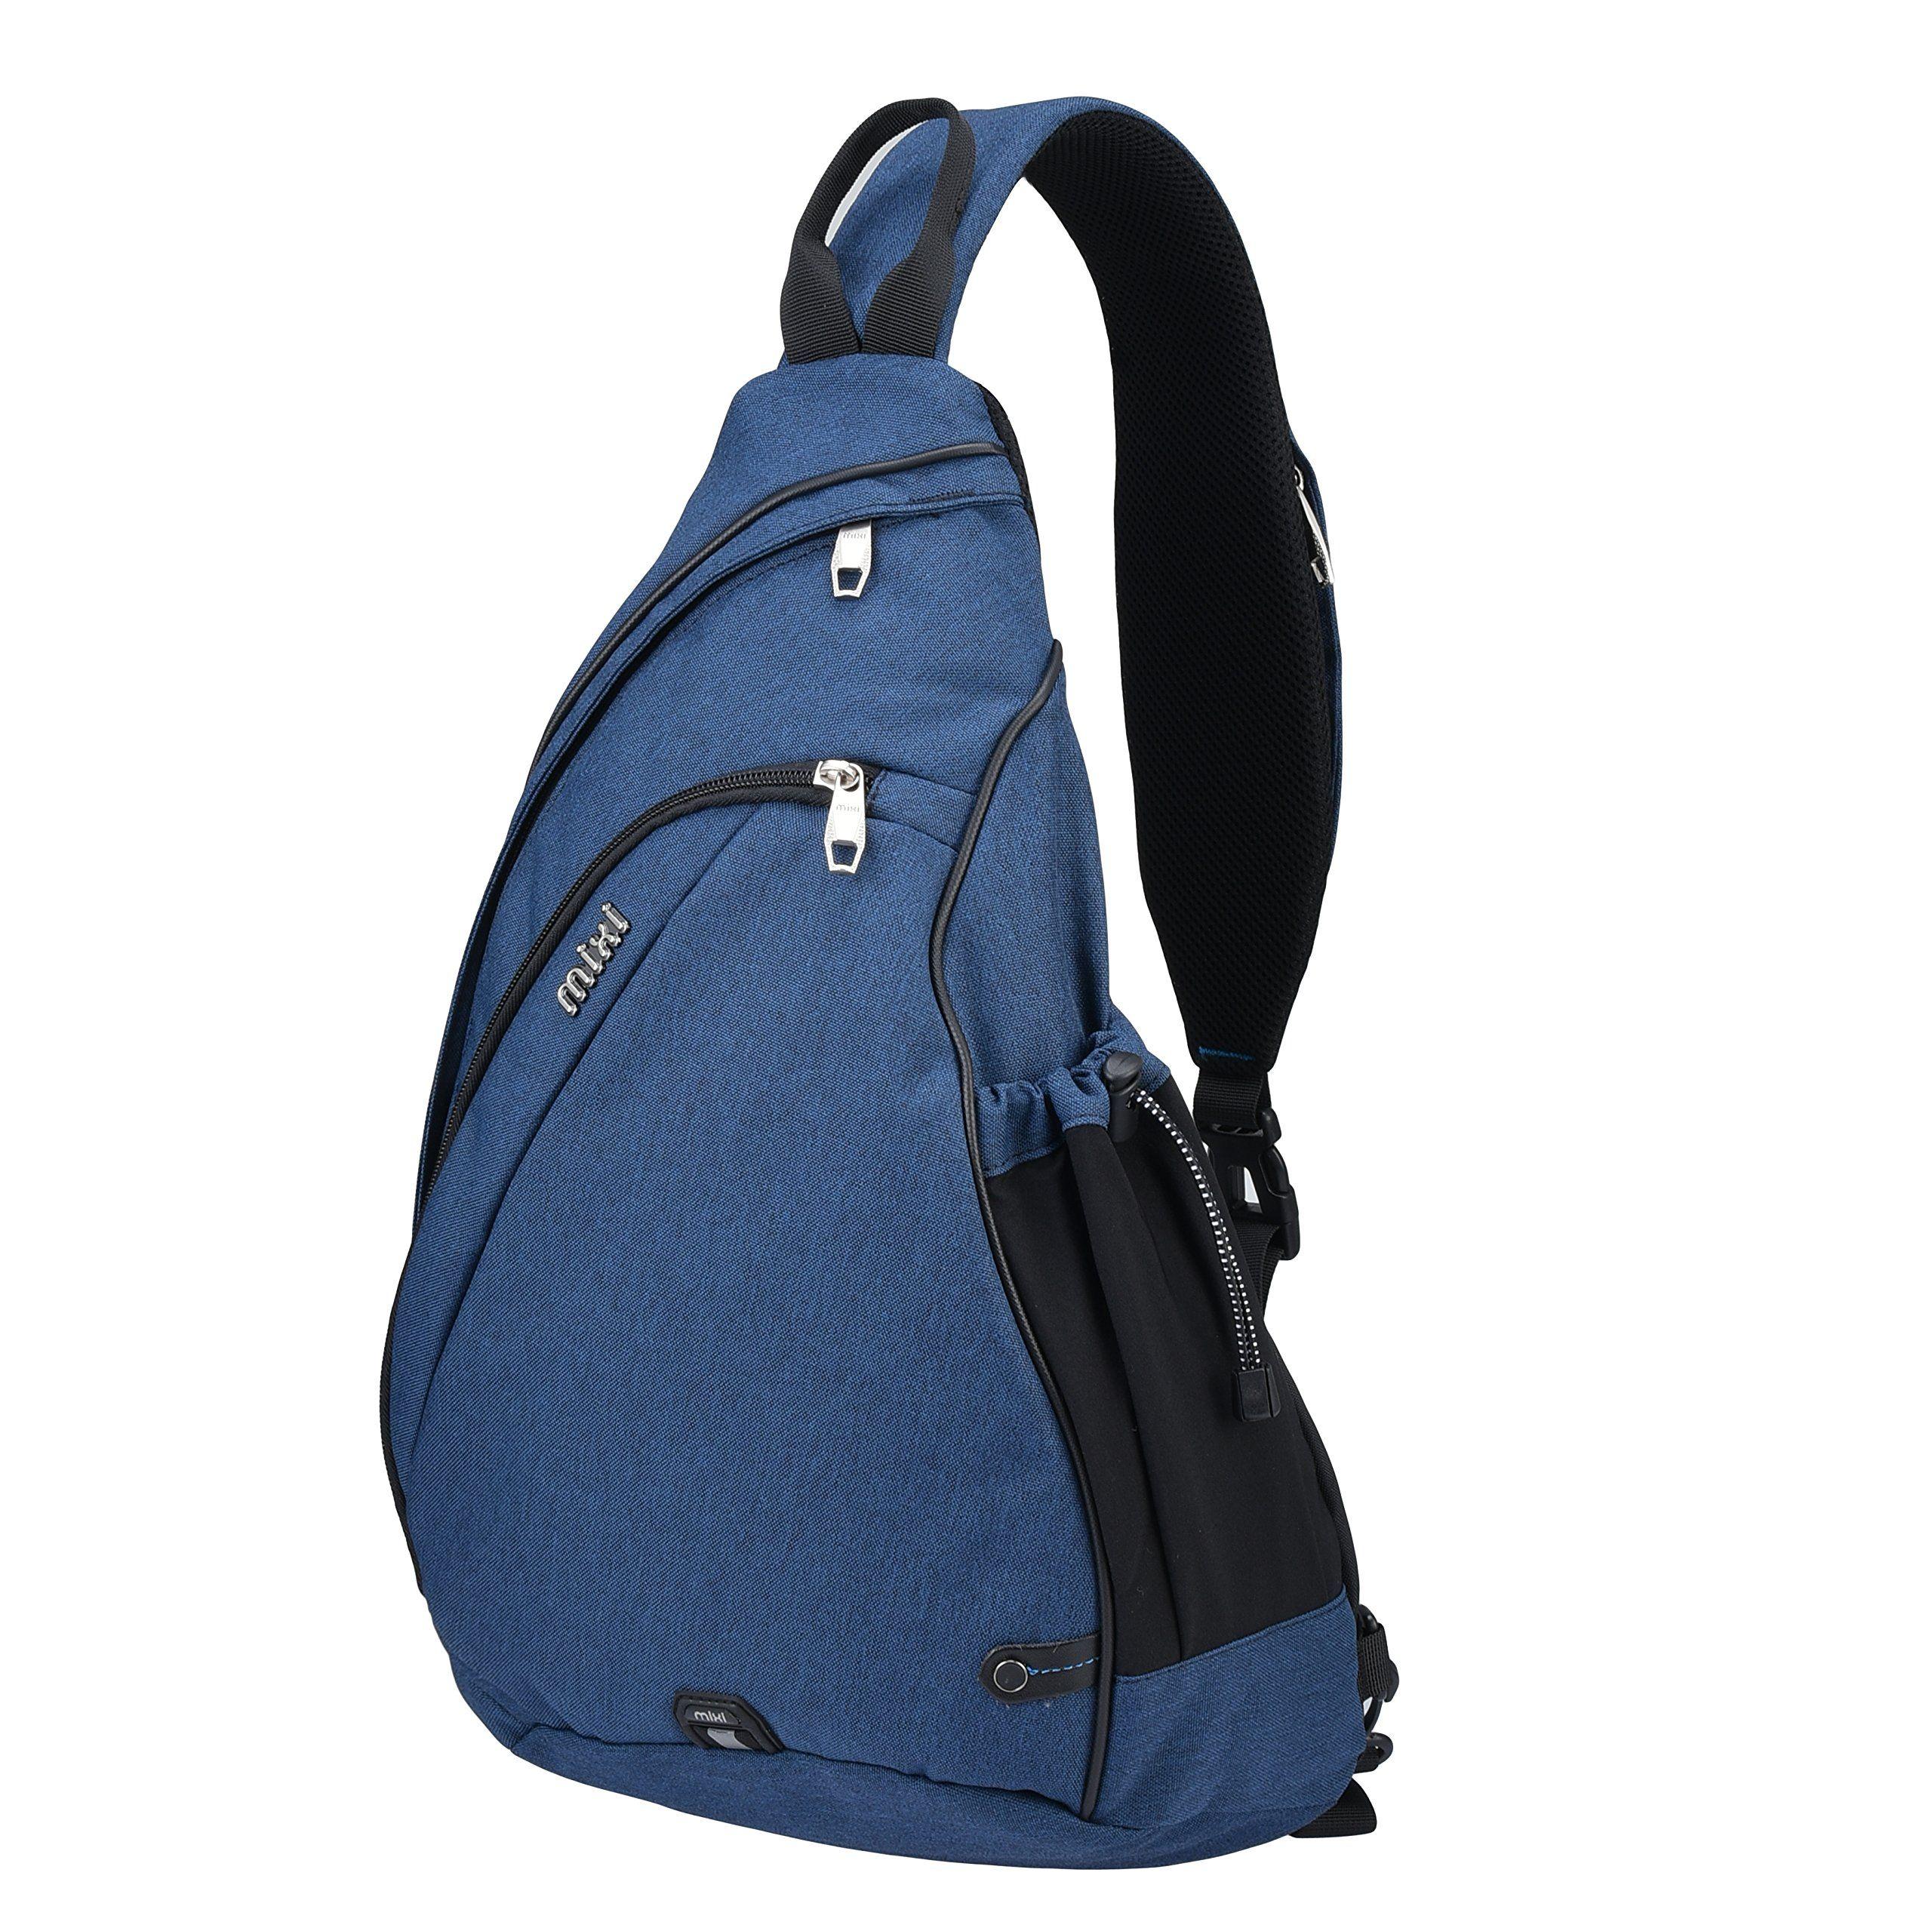 fdddb1b817 Mixi Sling Bag Shoulder Backpack CrossBody Chest Bags Cycling Travel